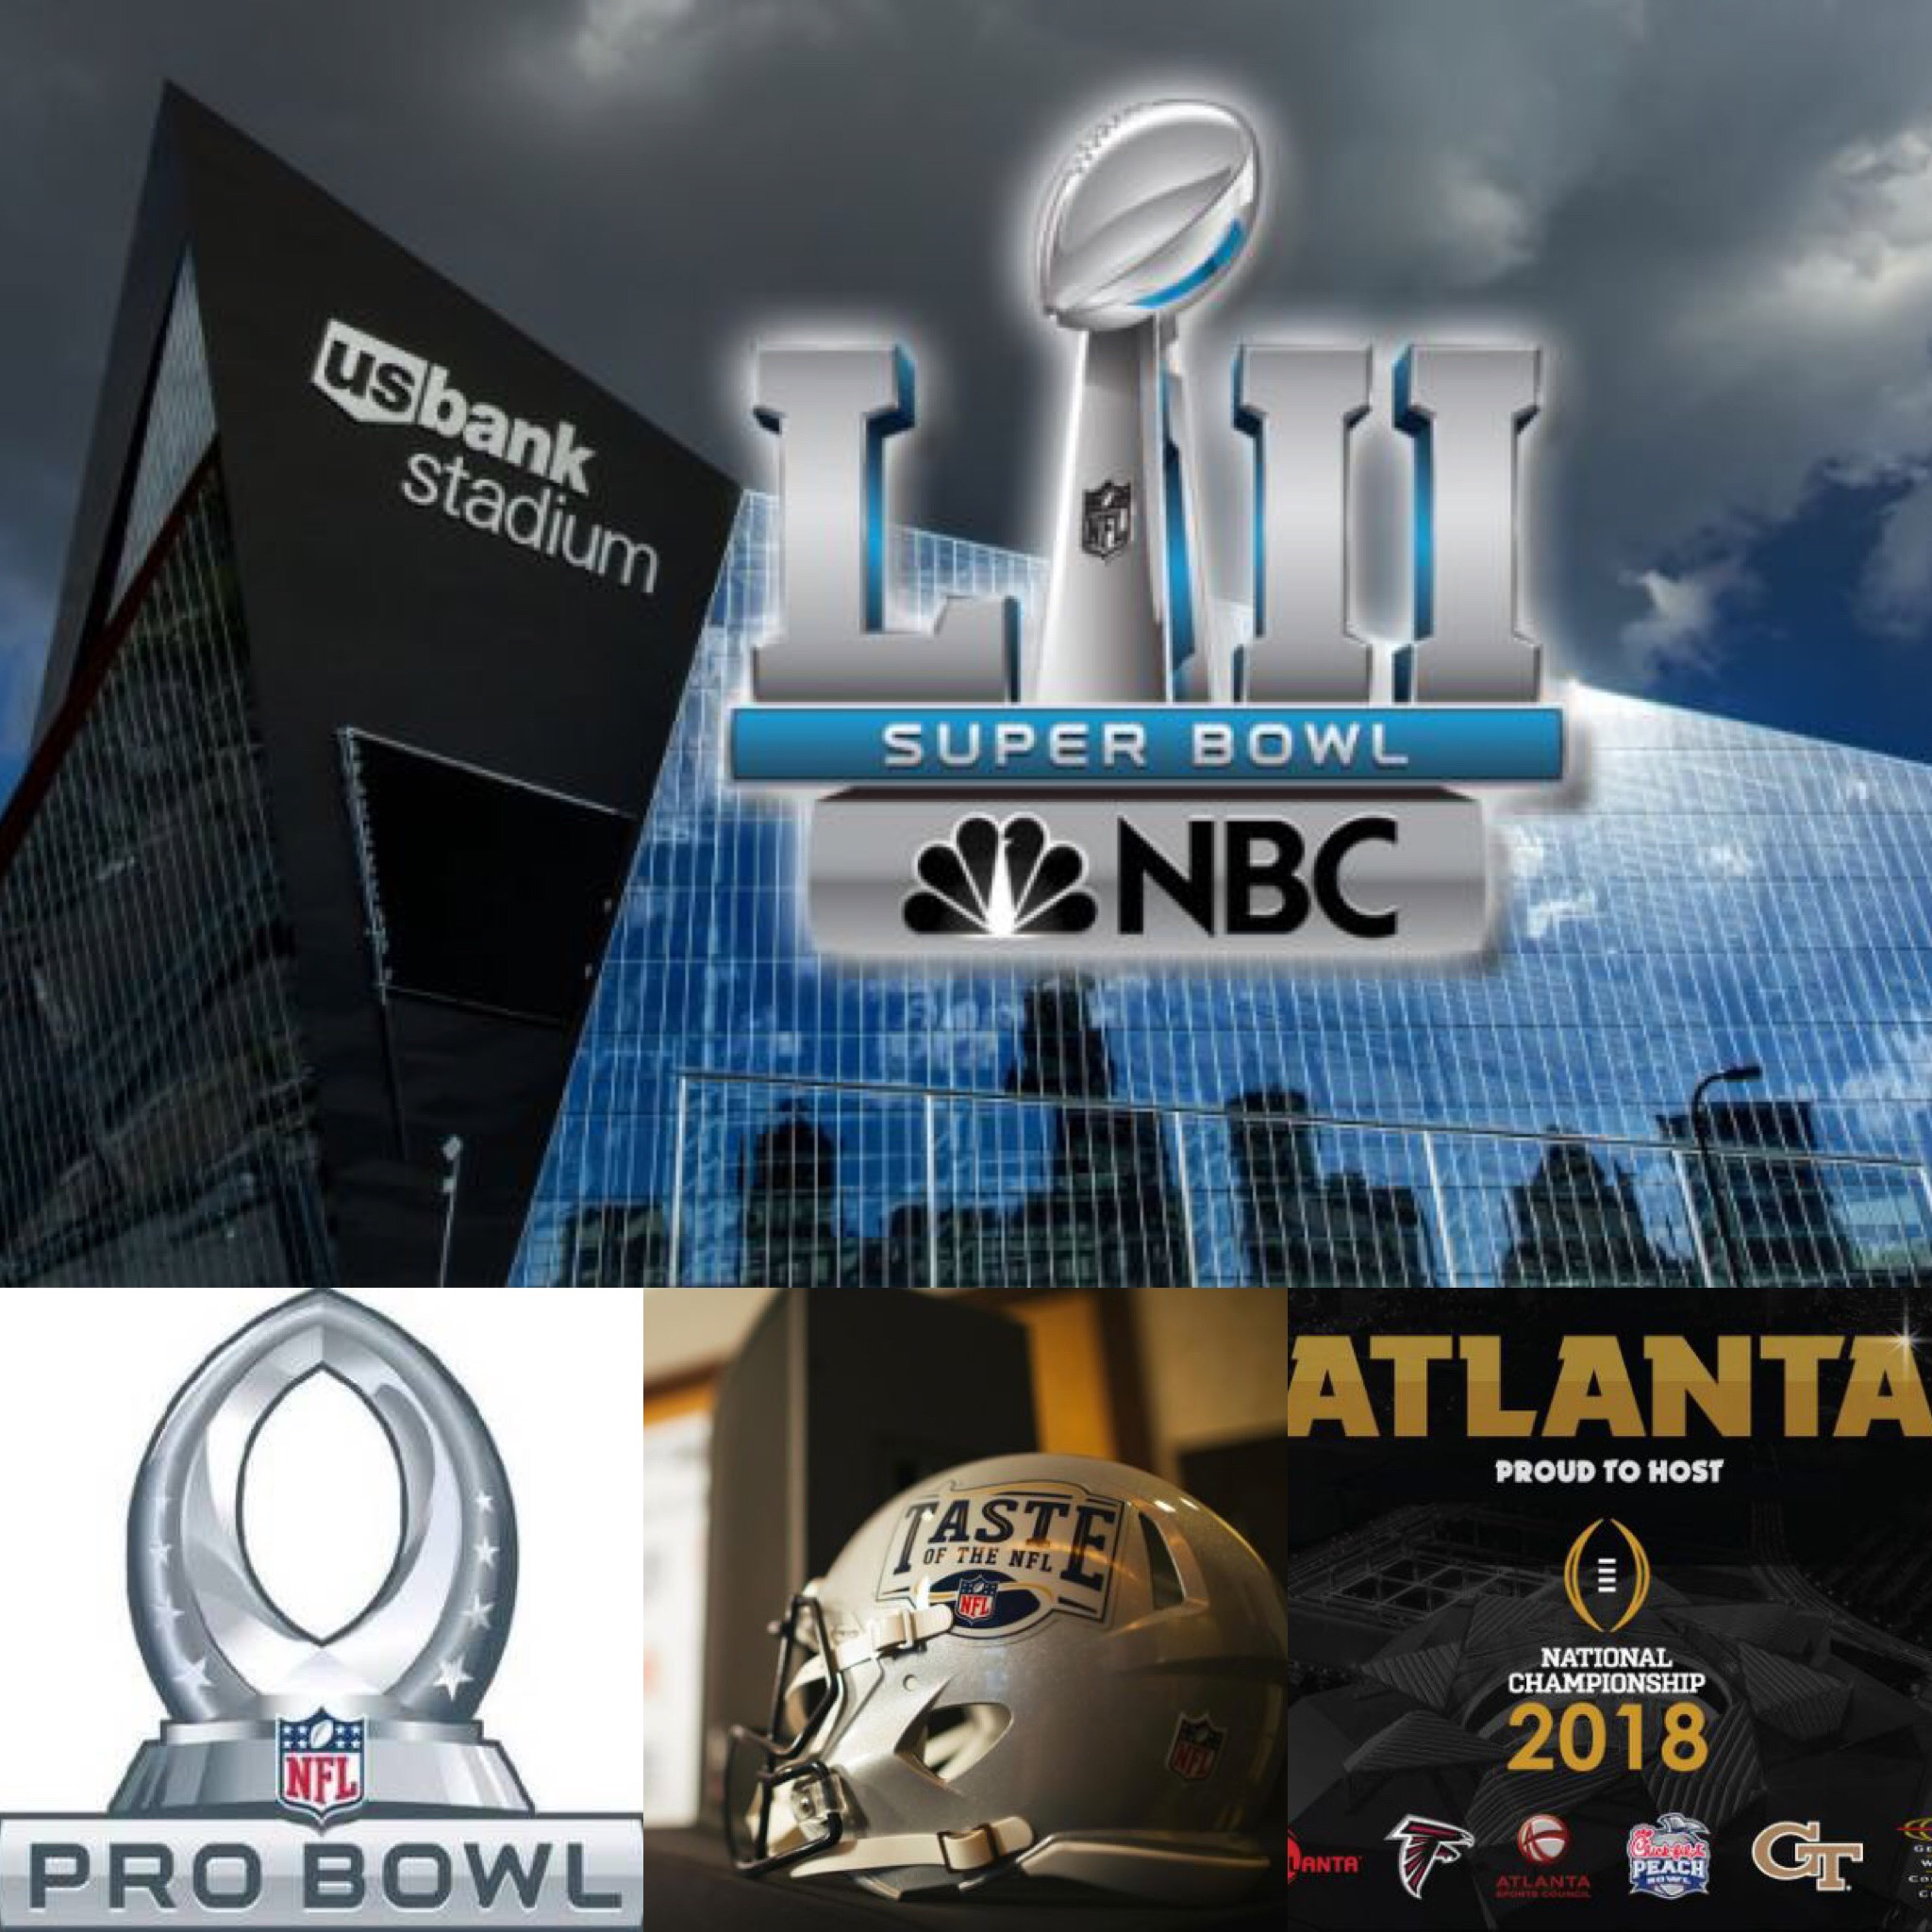 2018 Lung Cancer Survivors Super Bowl Challenge